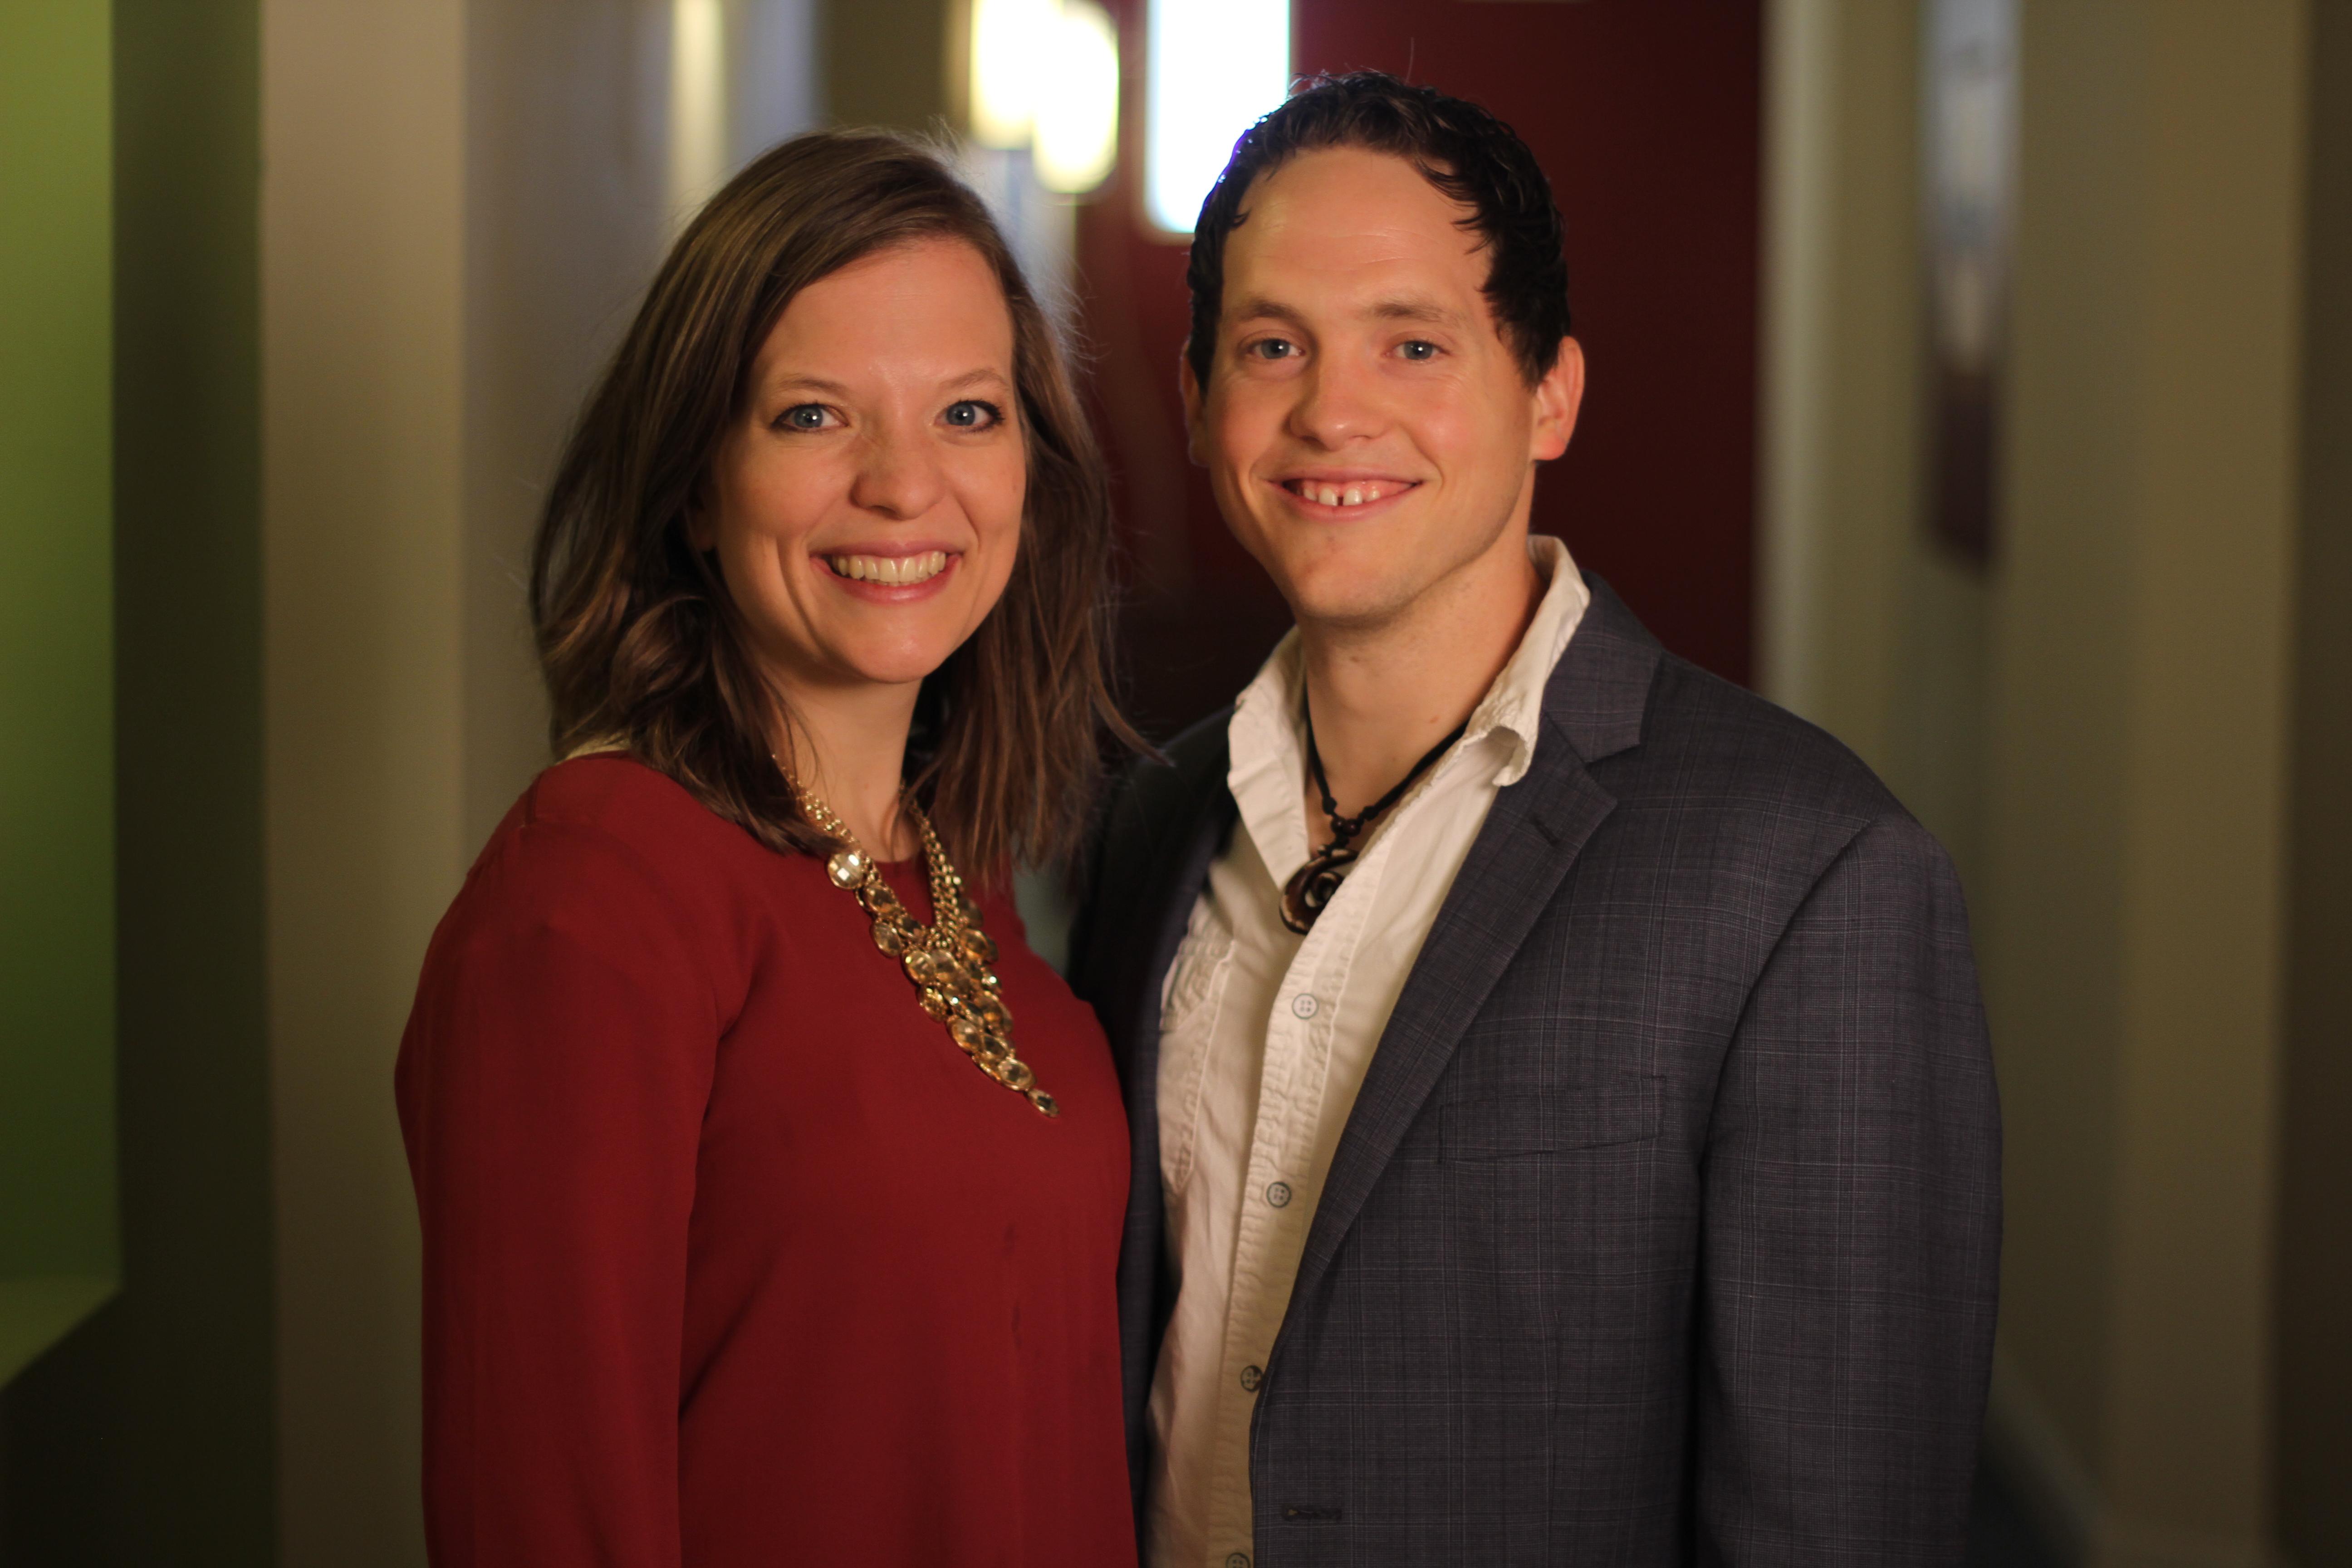 Tyler and Emily Watson